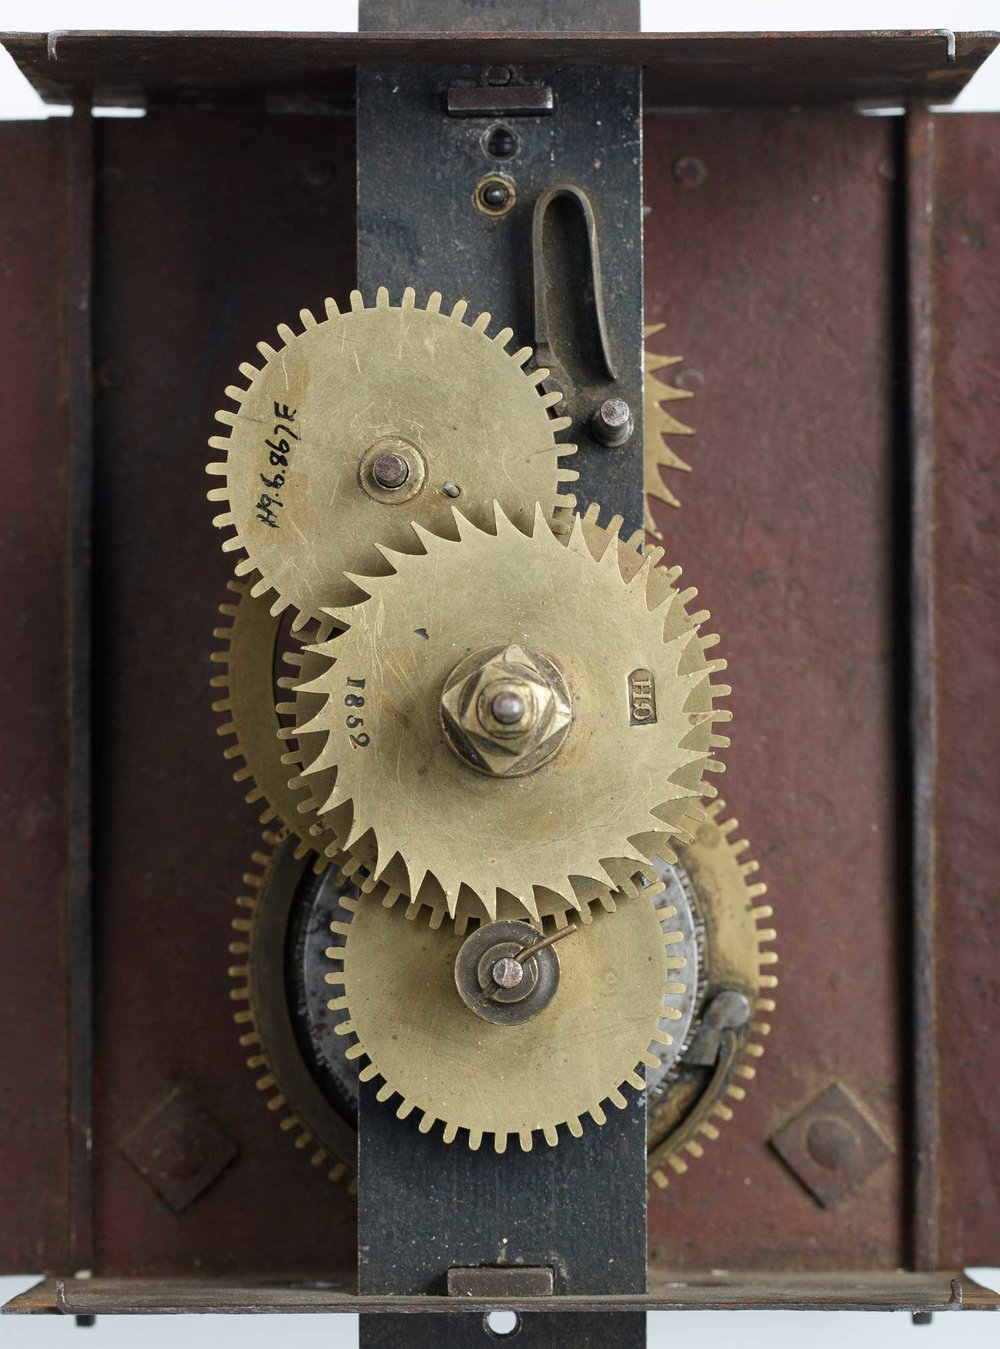 hamm-kroeger-clock-mc0258-5.jpg